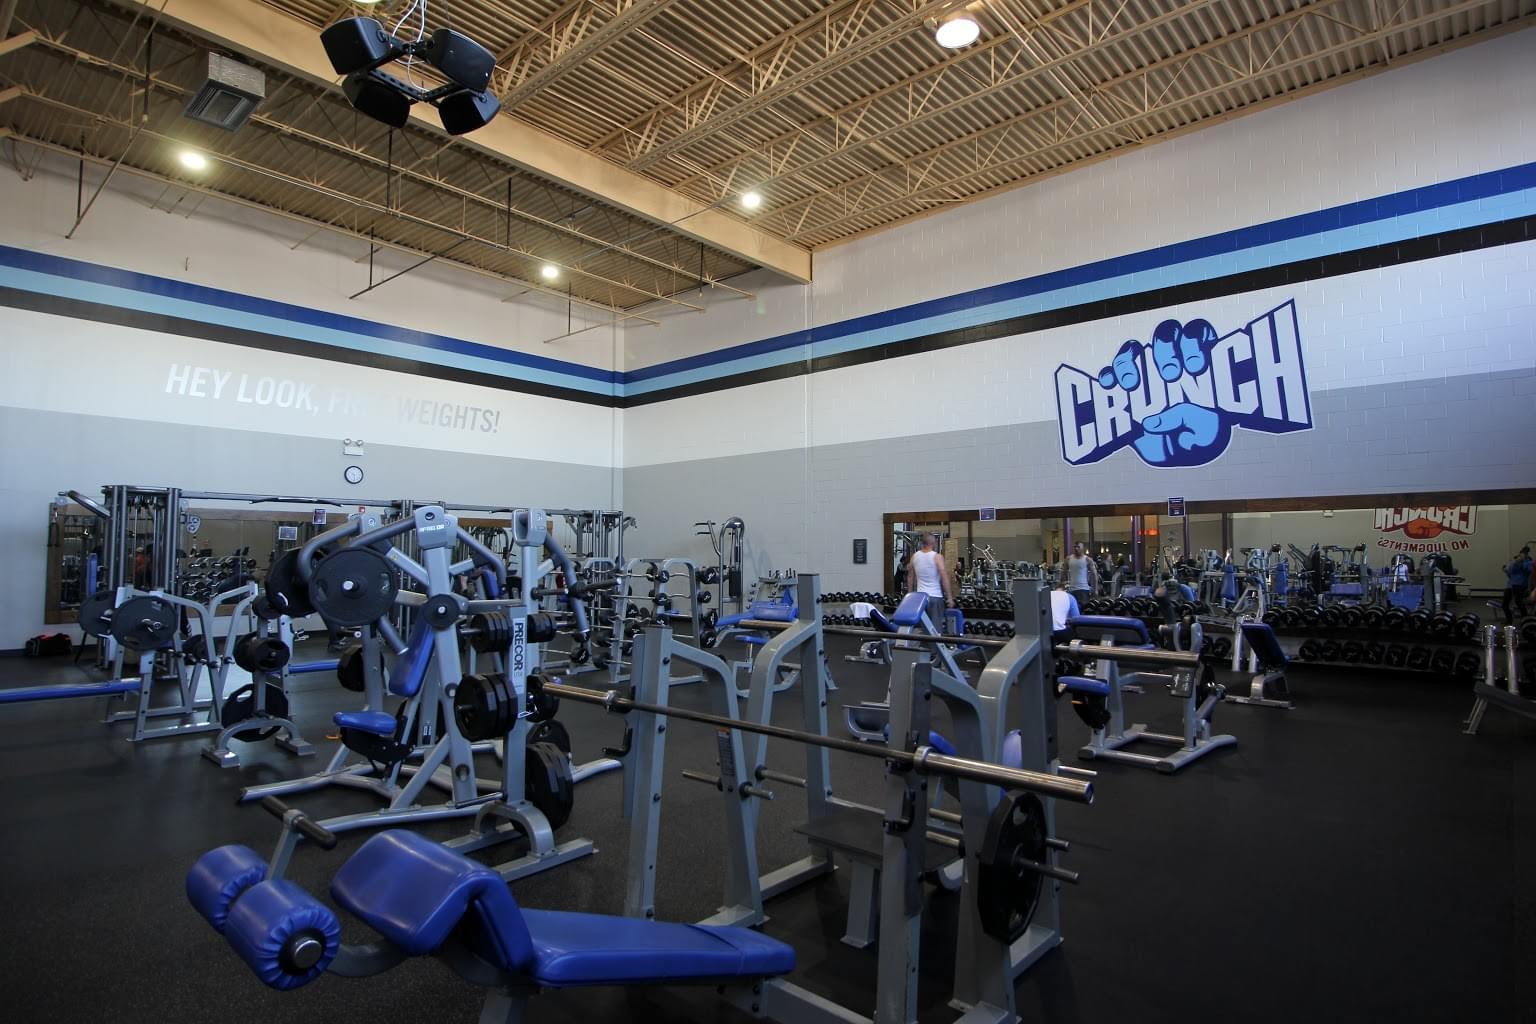 Crunch Fitness Gym In Richmond Va Google Business View